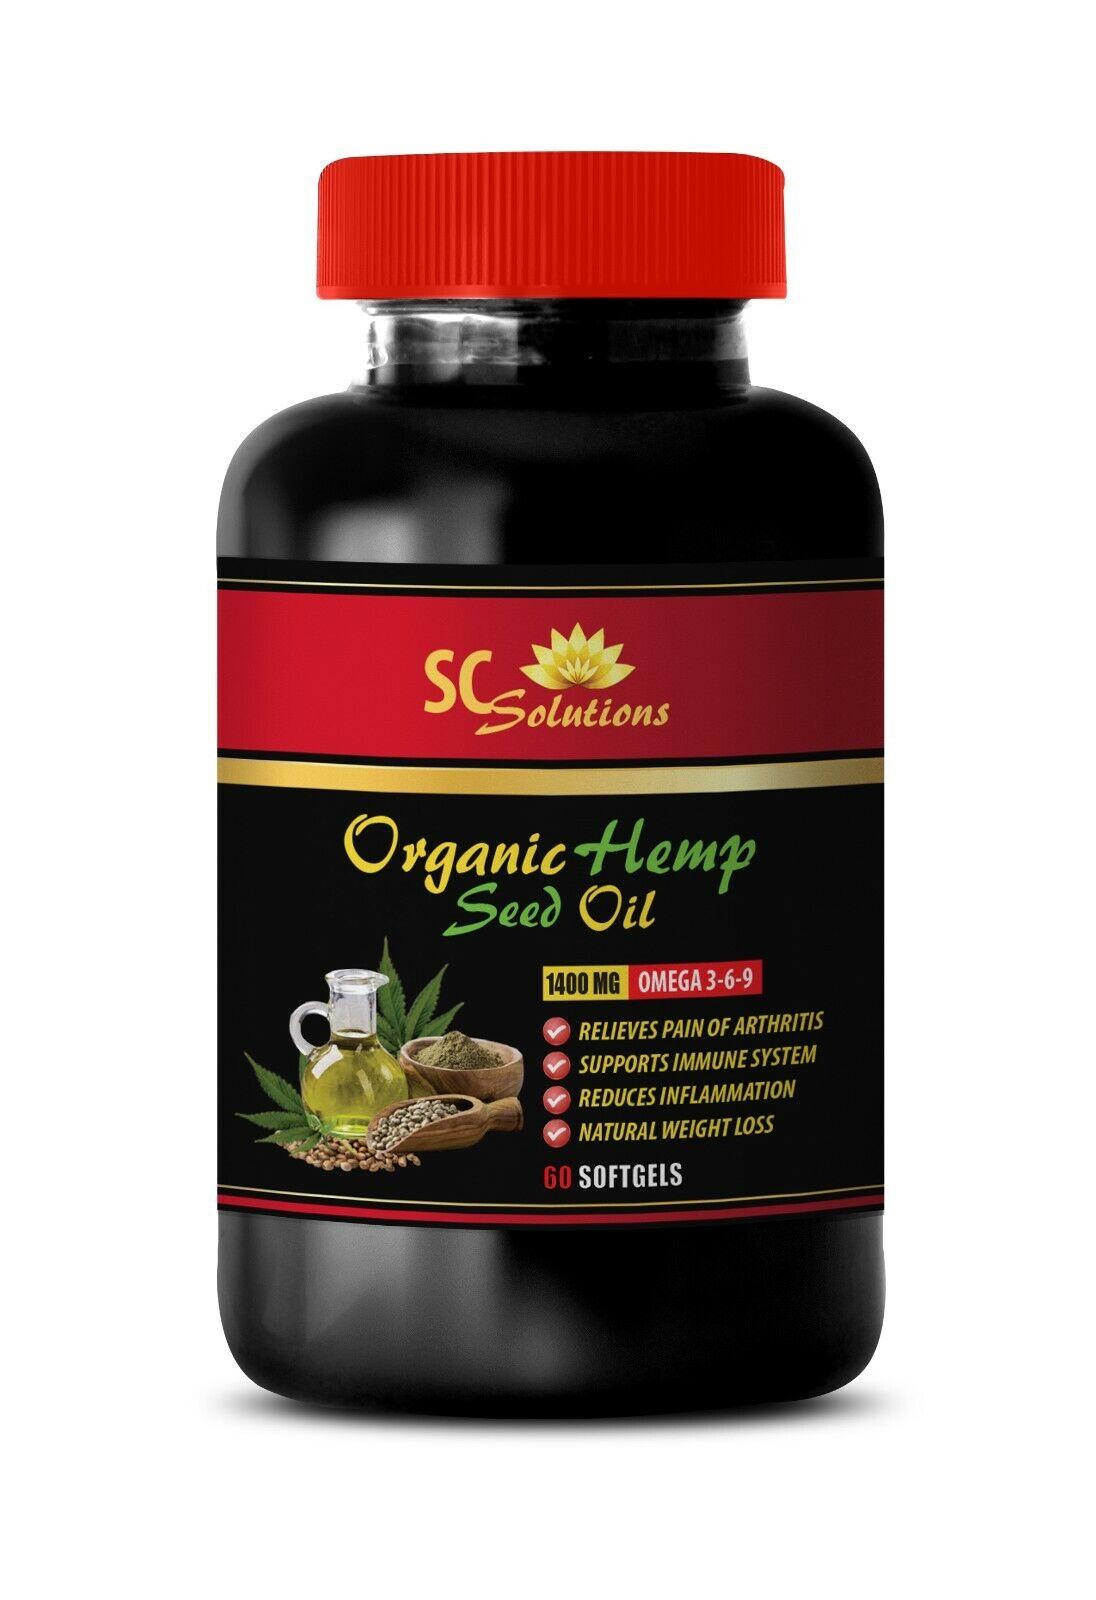 hemp oil for pain relief, ORGANIC HEMP SEED OIL 1400mg, omega acids 1 Bottle